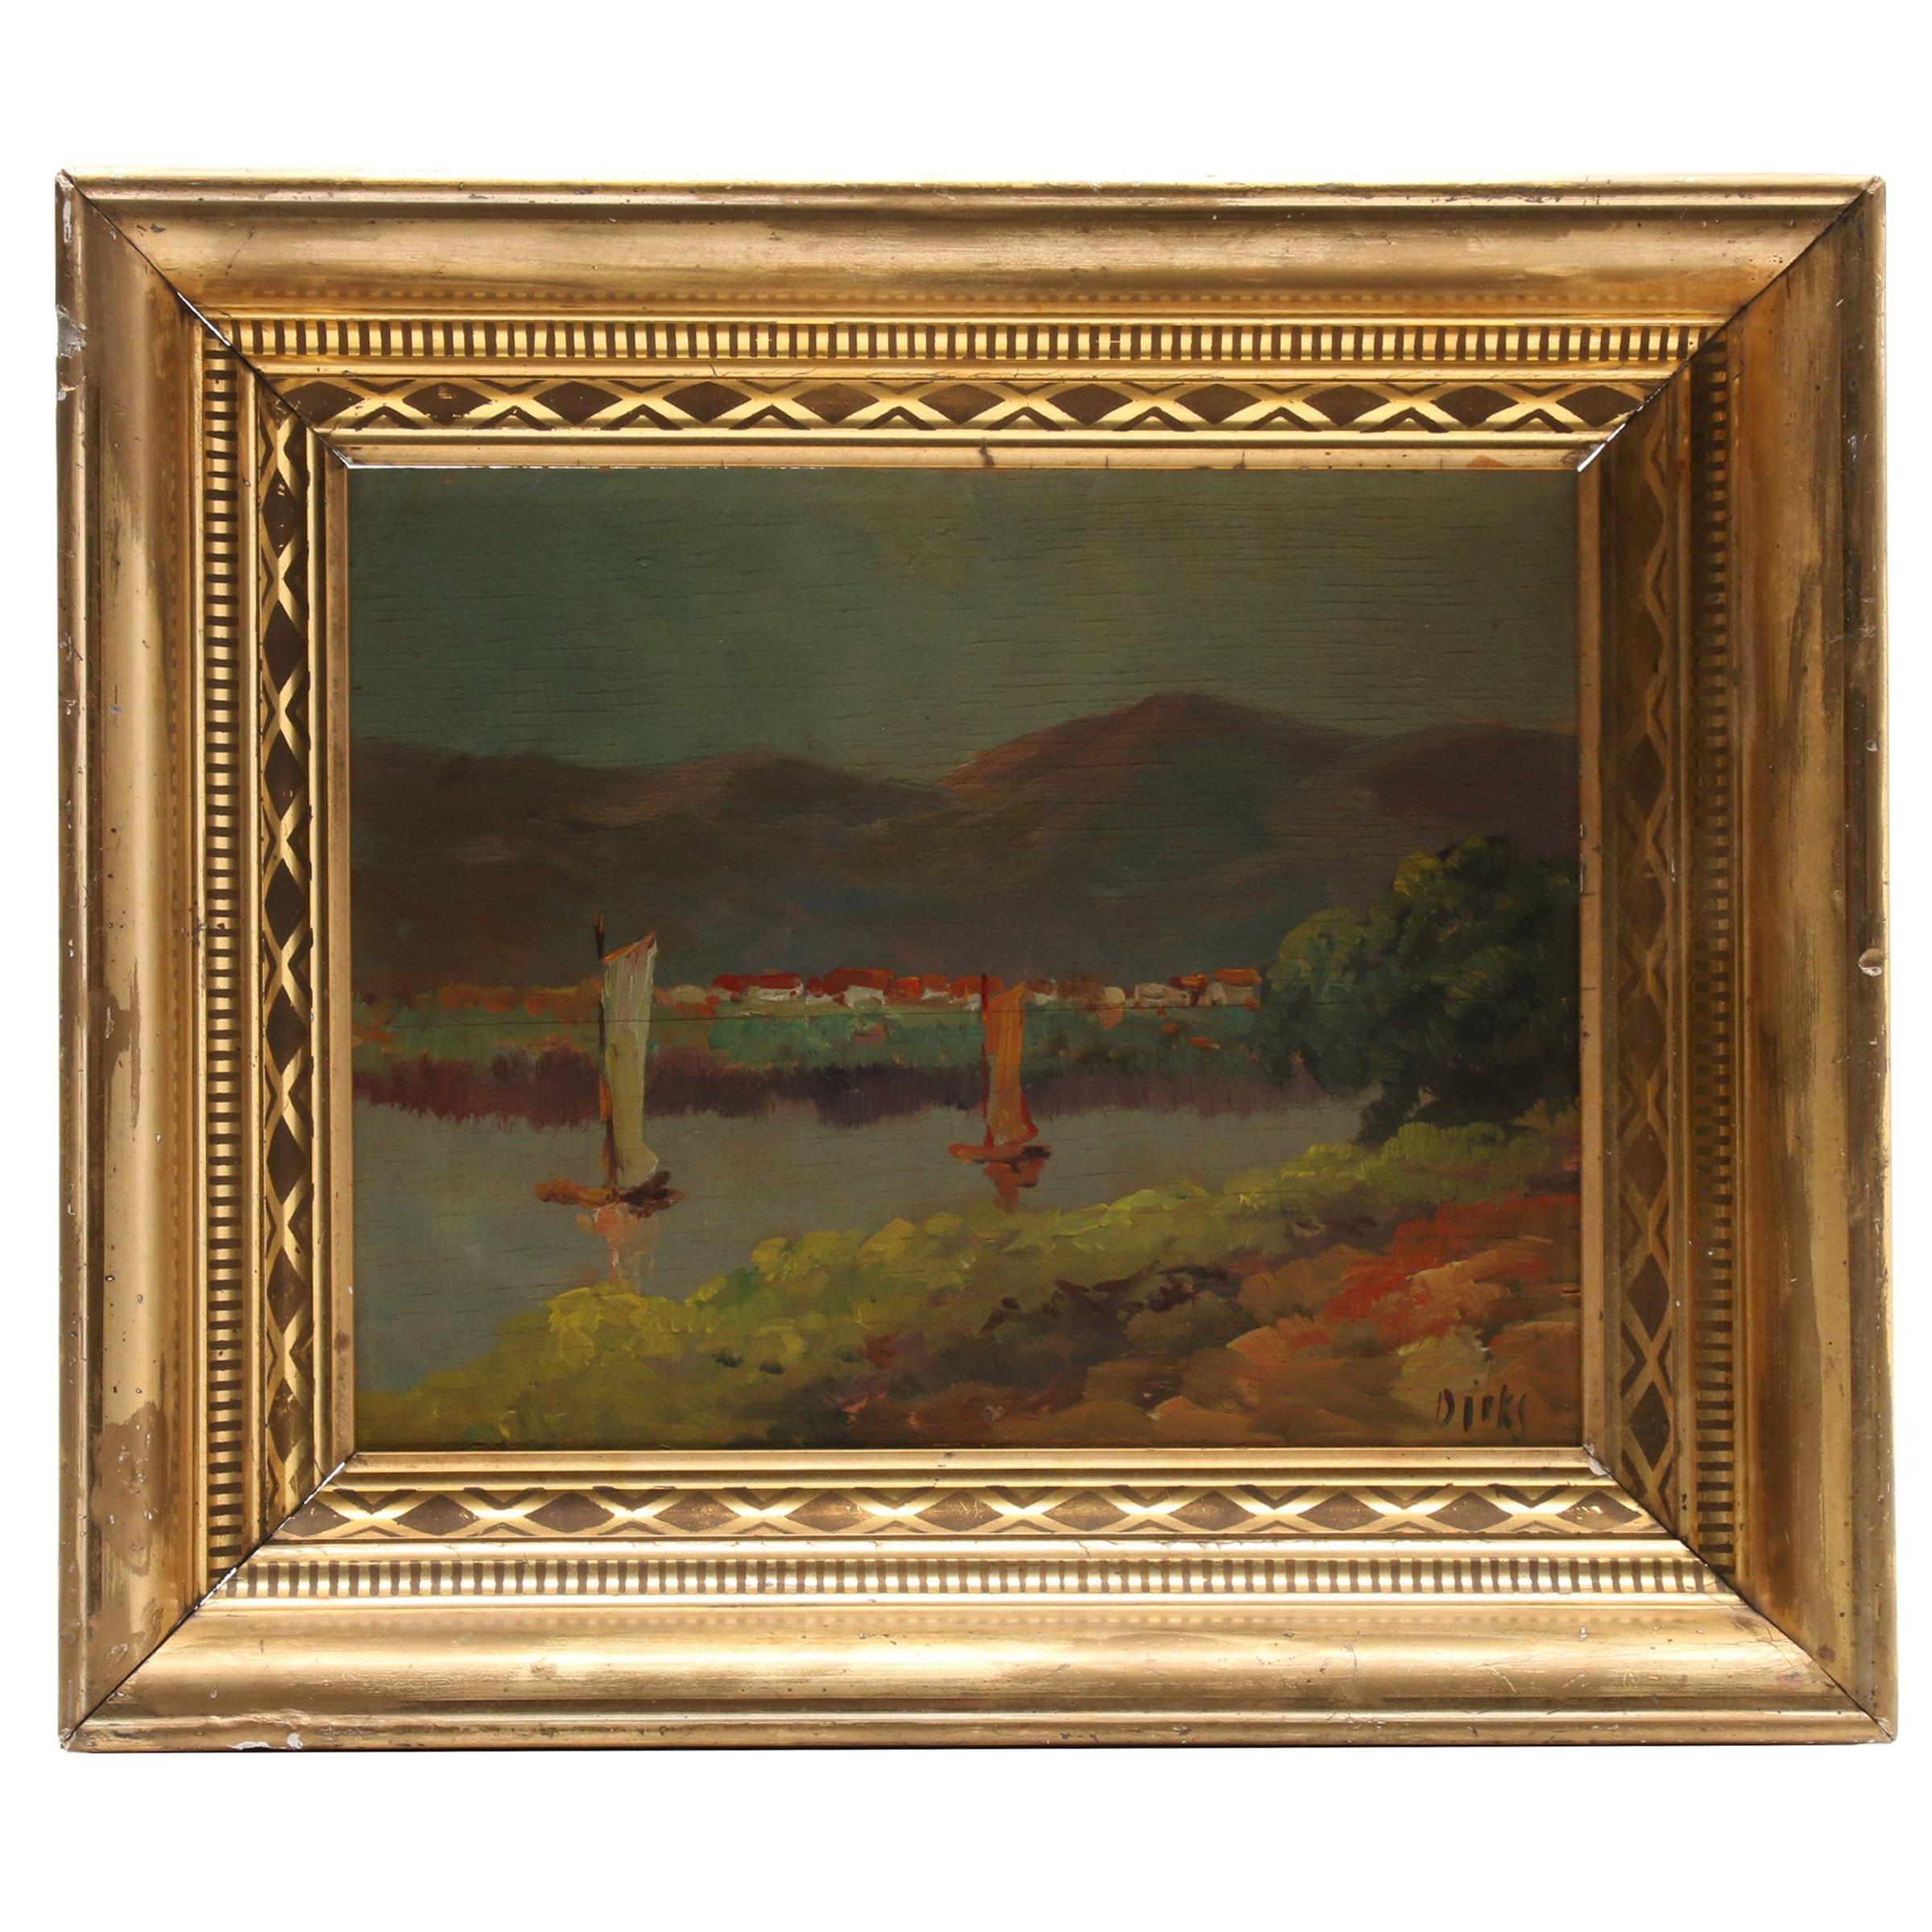 Naïve River Landscape Oil Painting on Board